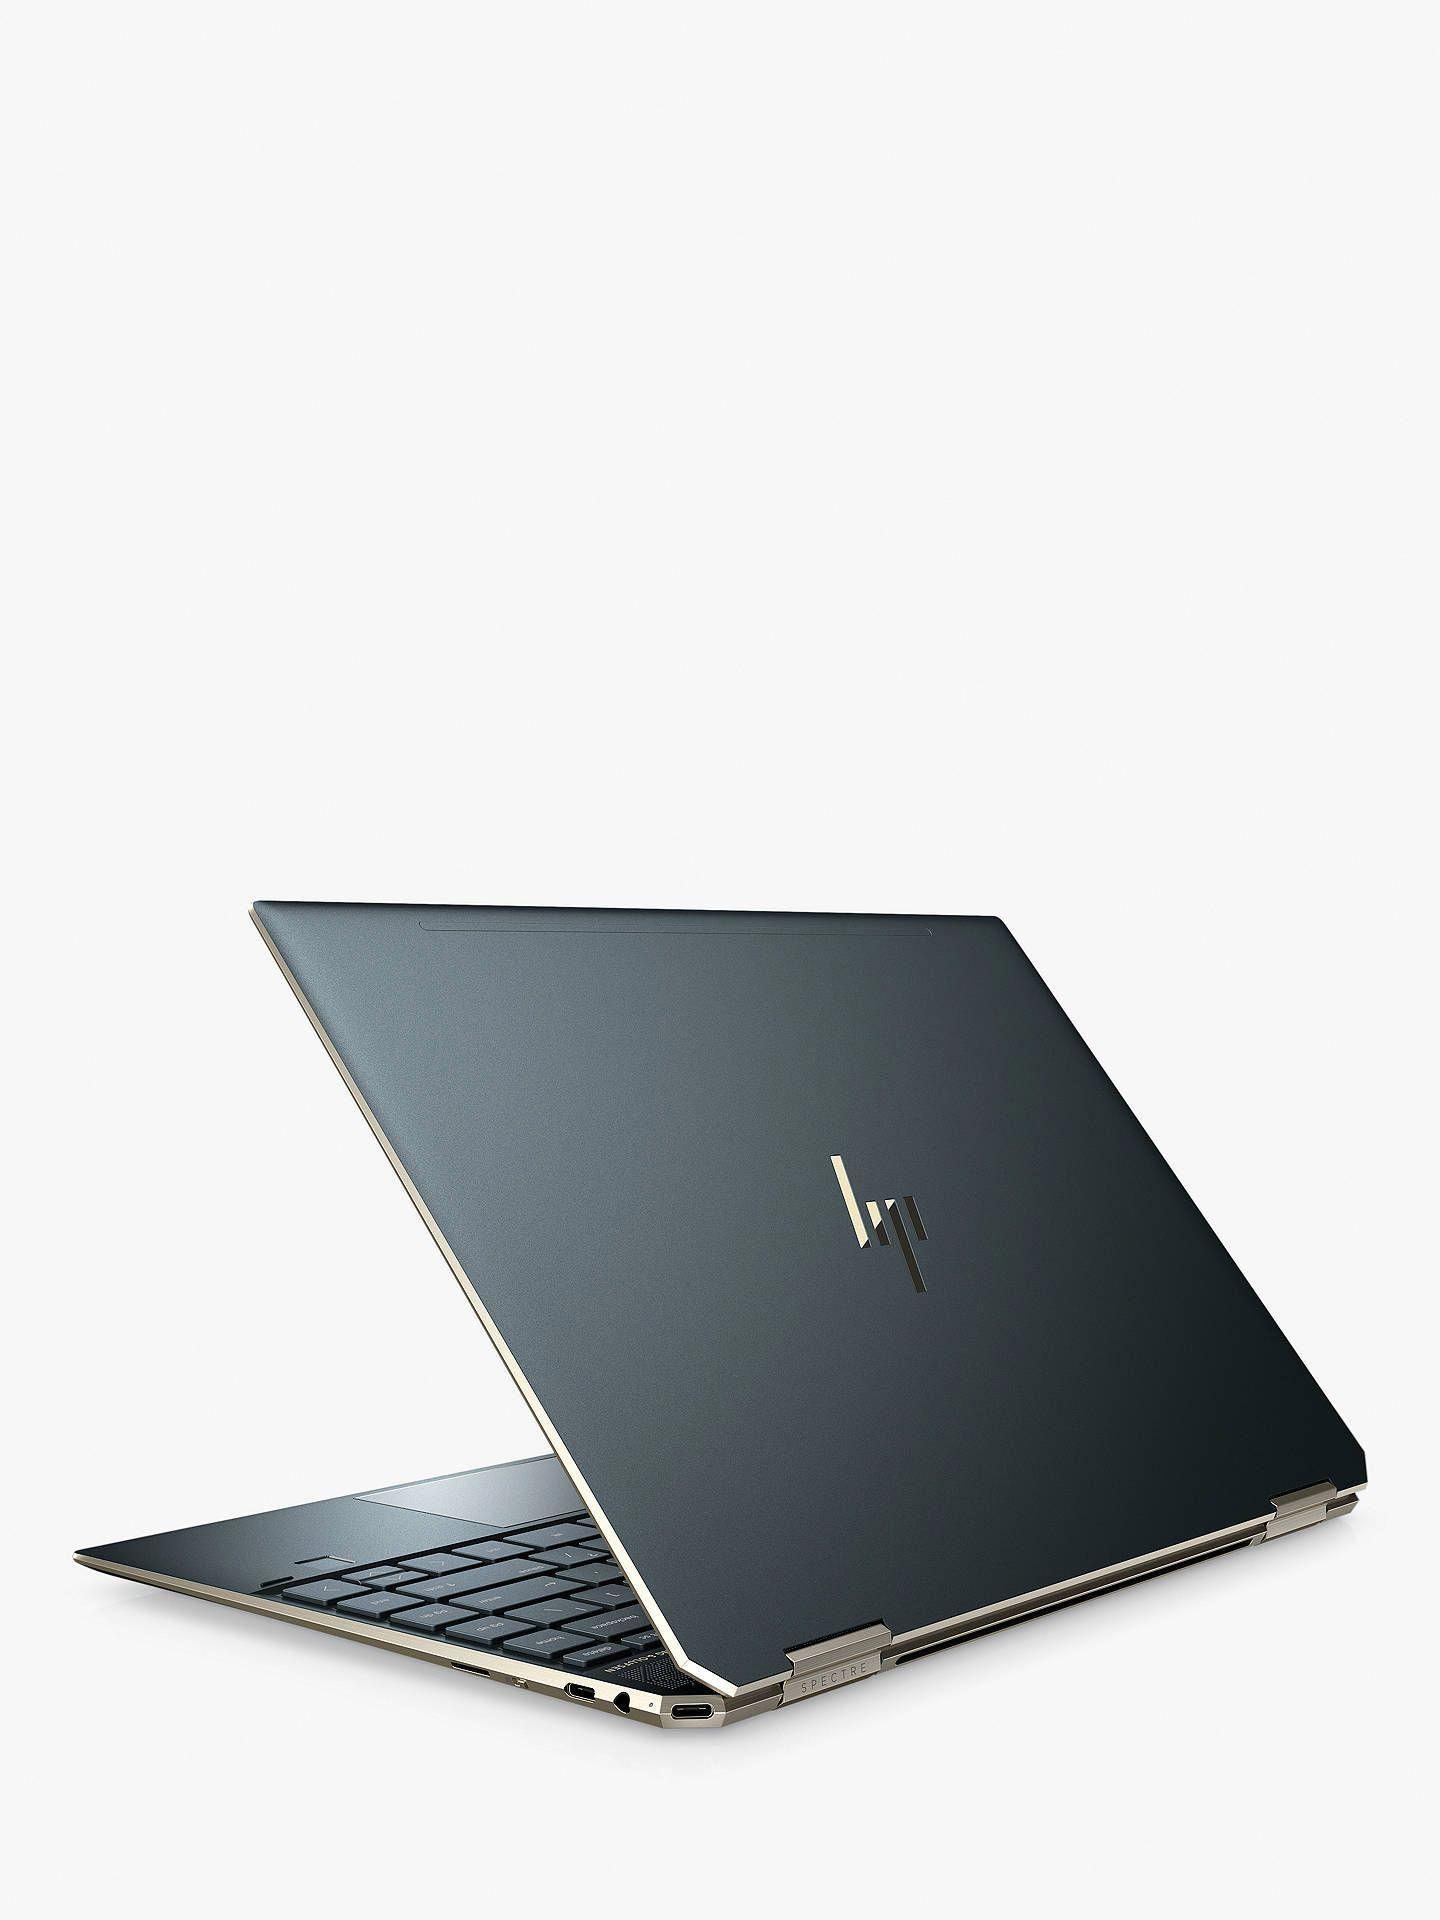 Hp Spectre X360 13 Ap0007na Convertible Laptop With Hp Tilt Pen Stylus Intel Core I7 8gb Ram 512gb Ssd 13 3 Full Hd Hp Laptop Hp Spectre Laptop Computers